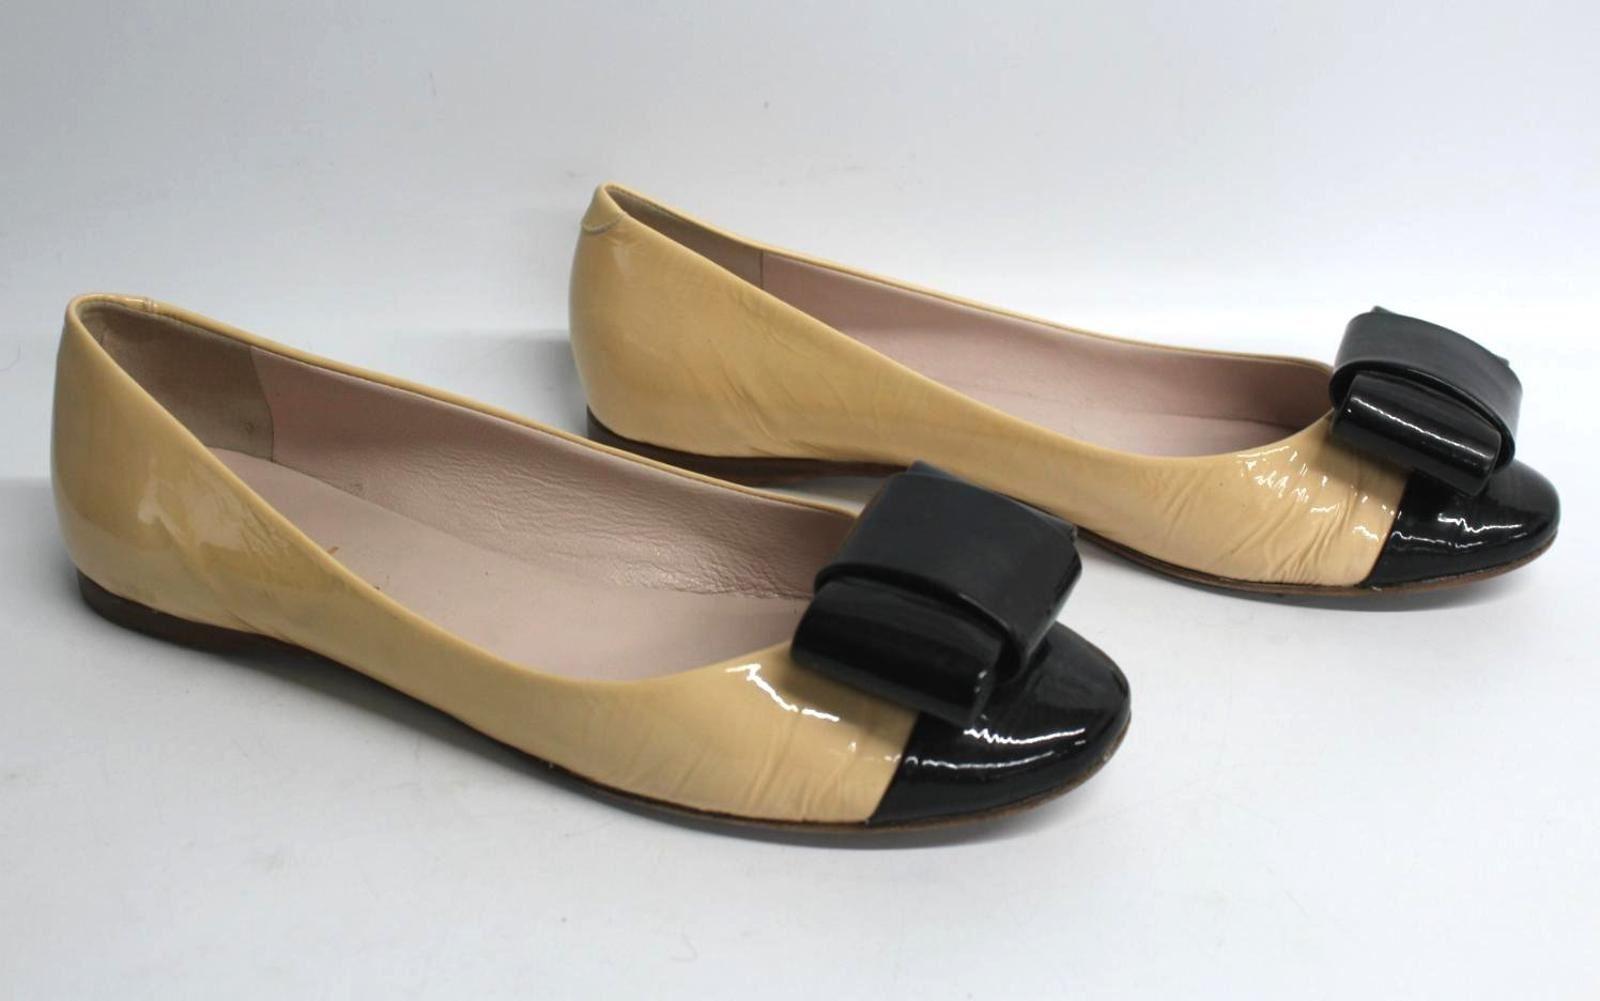 OLIVIERS-LOUNGE-Ladies-Beige-Leather-Round-Toe-Ballerinas-Flat-Shoes-UK6-EU39